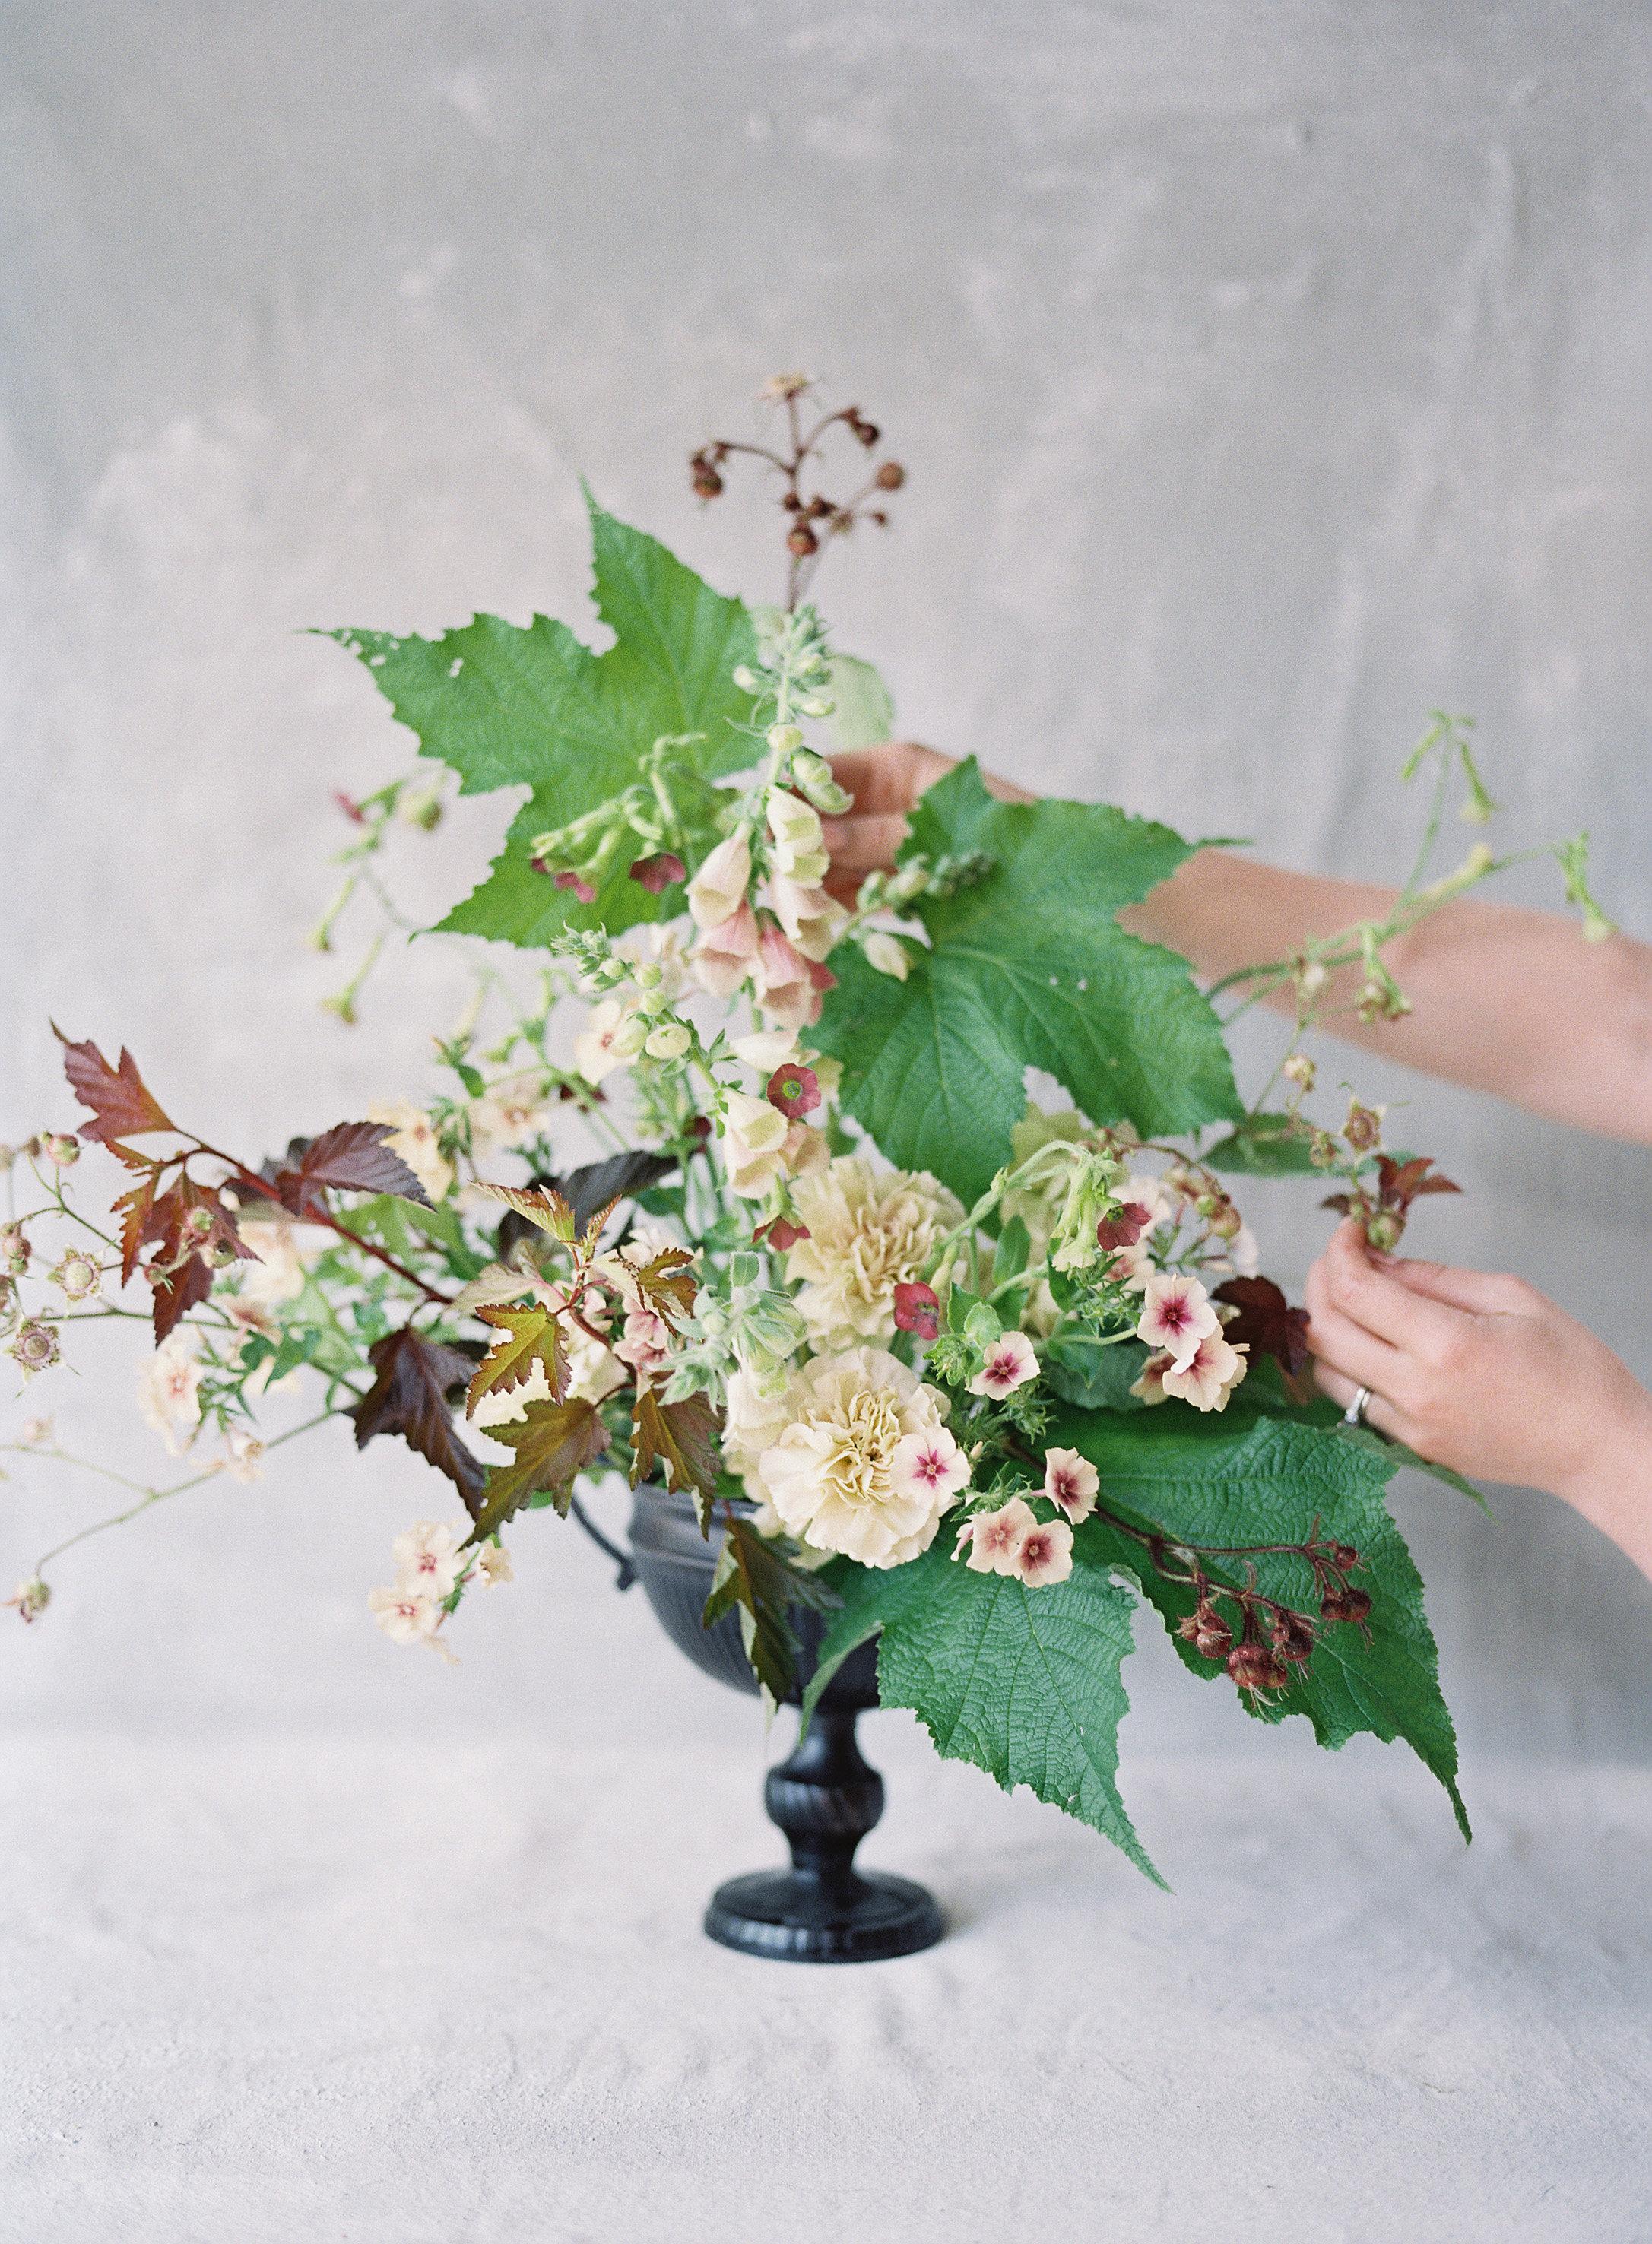 free online classes for floral design